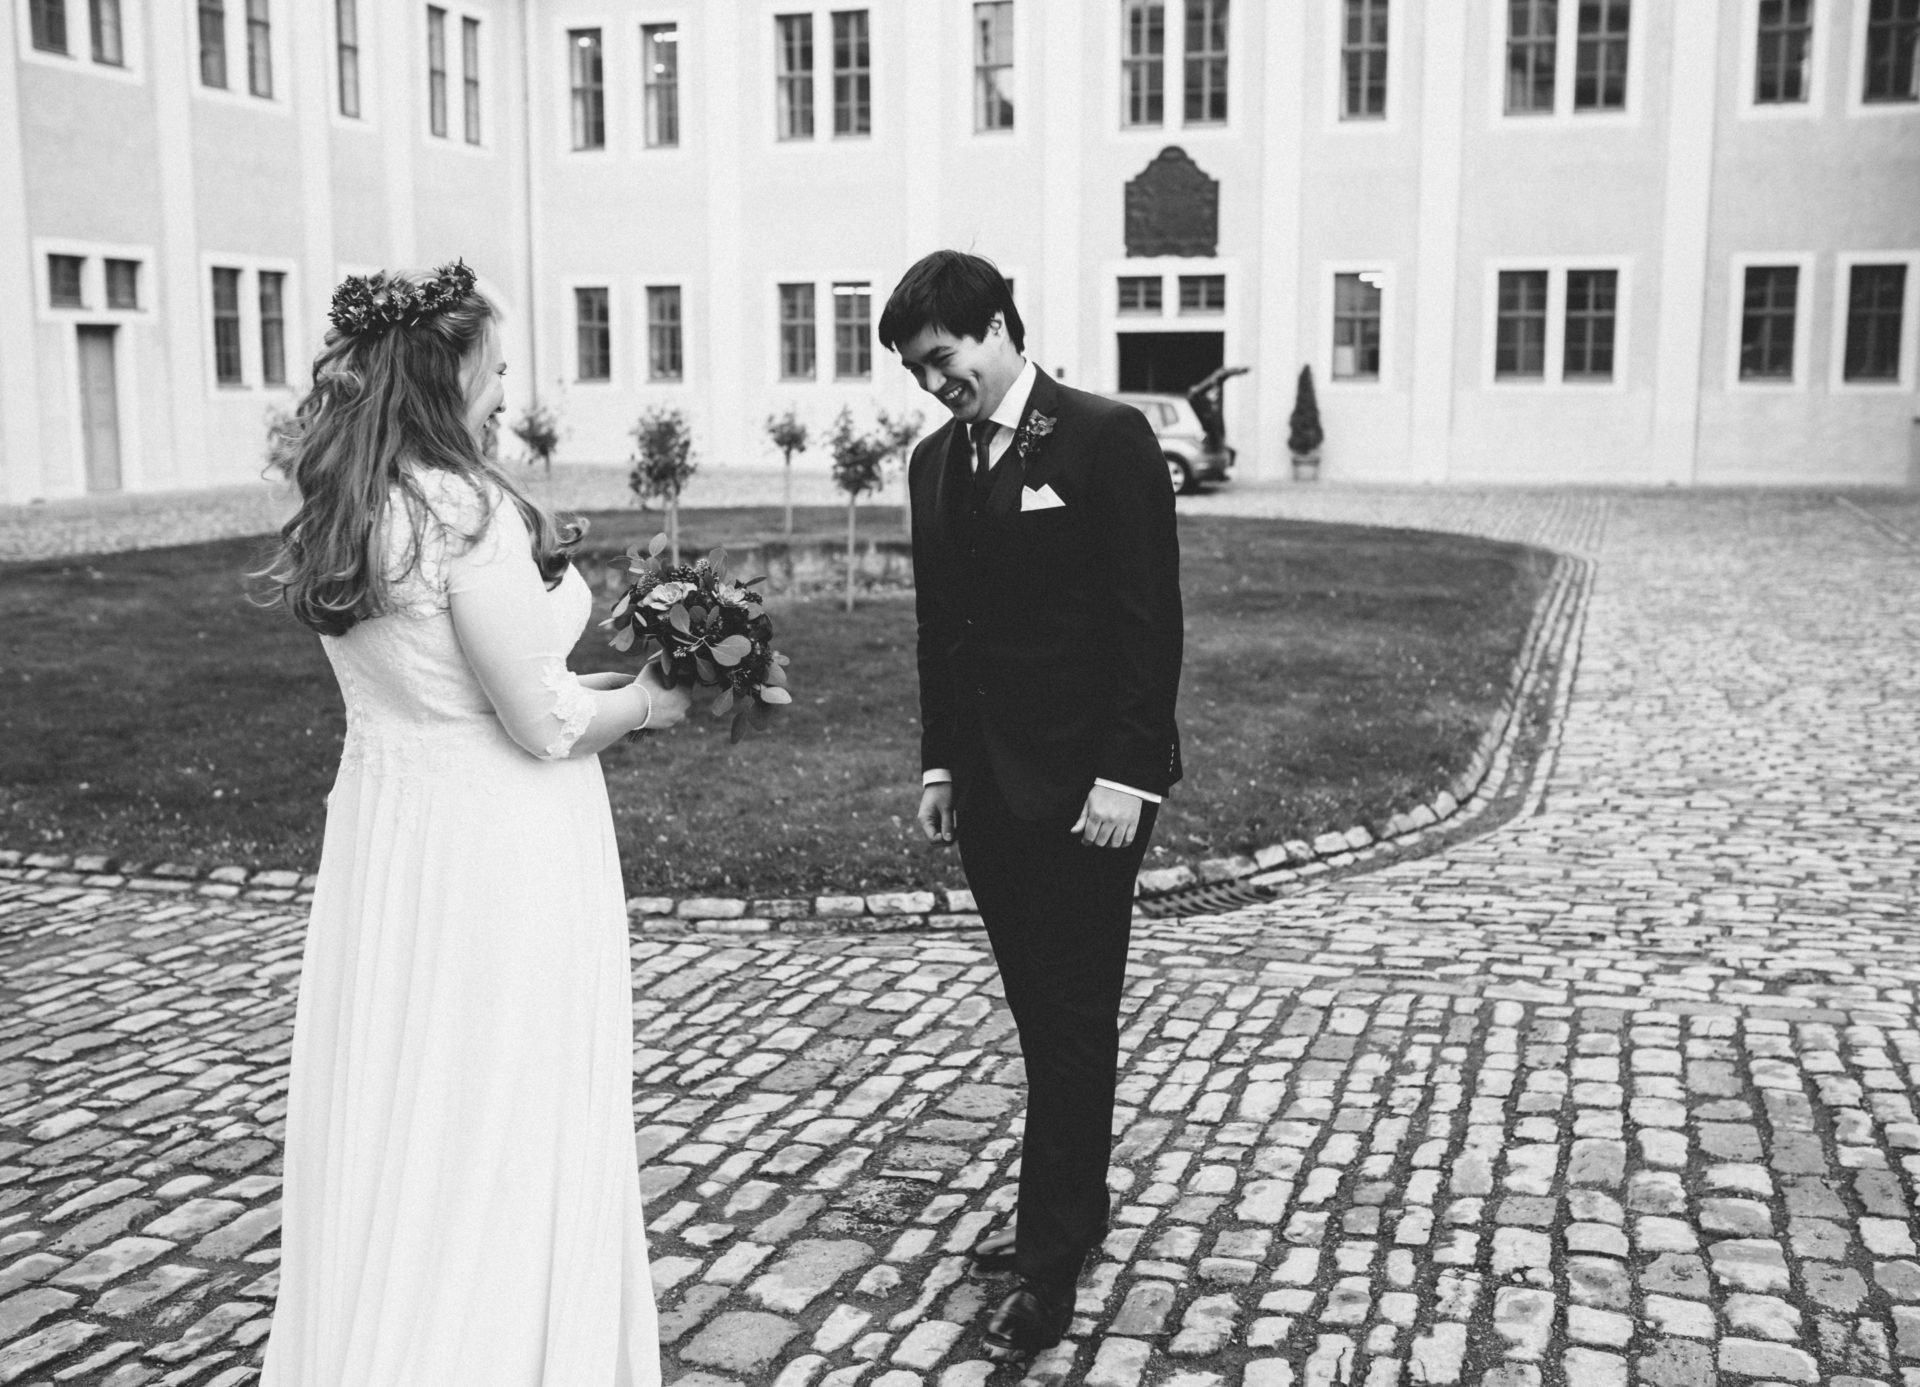 50mmfreunde Erfurt Jena Weimar Ettersburg Hochzeit 08 1920x1387 - Dezemberhochzeit im Schloss Ettersburg bei Weimar